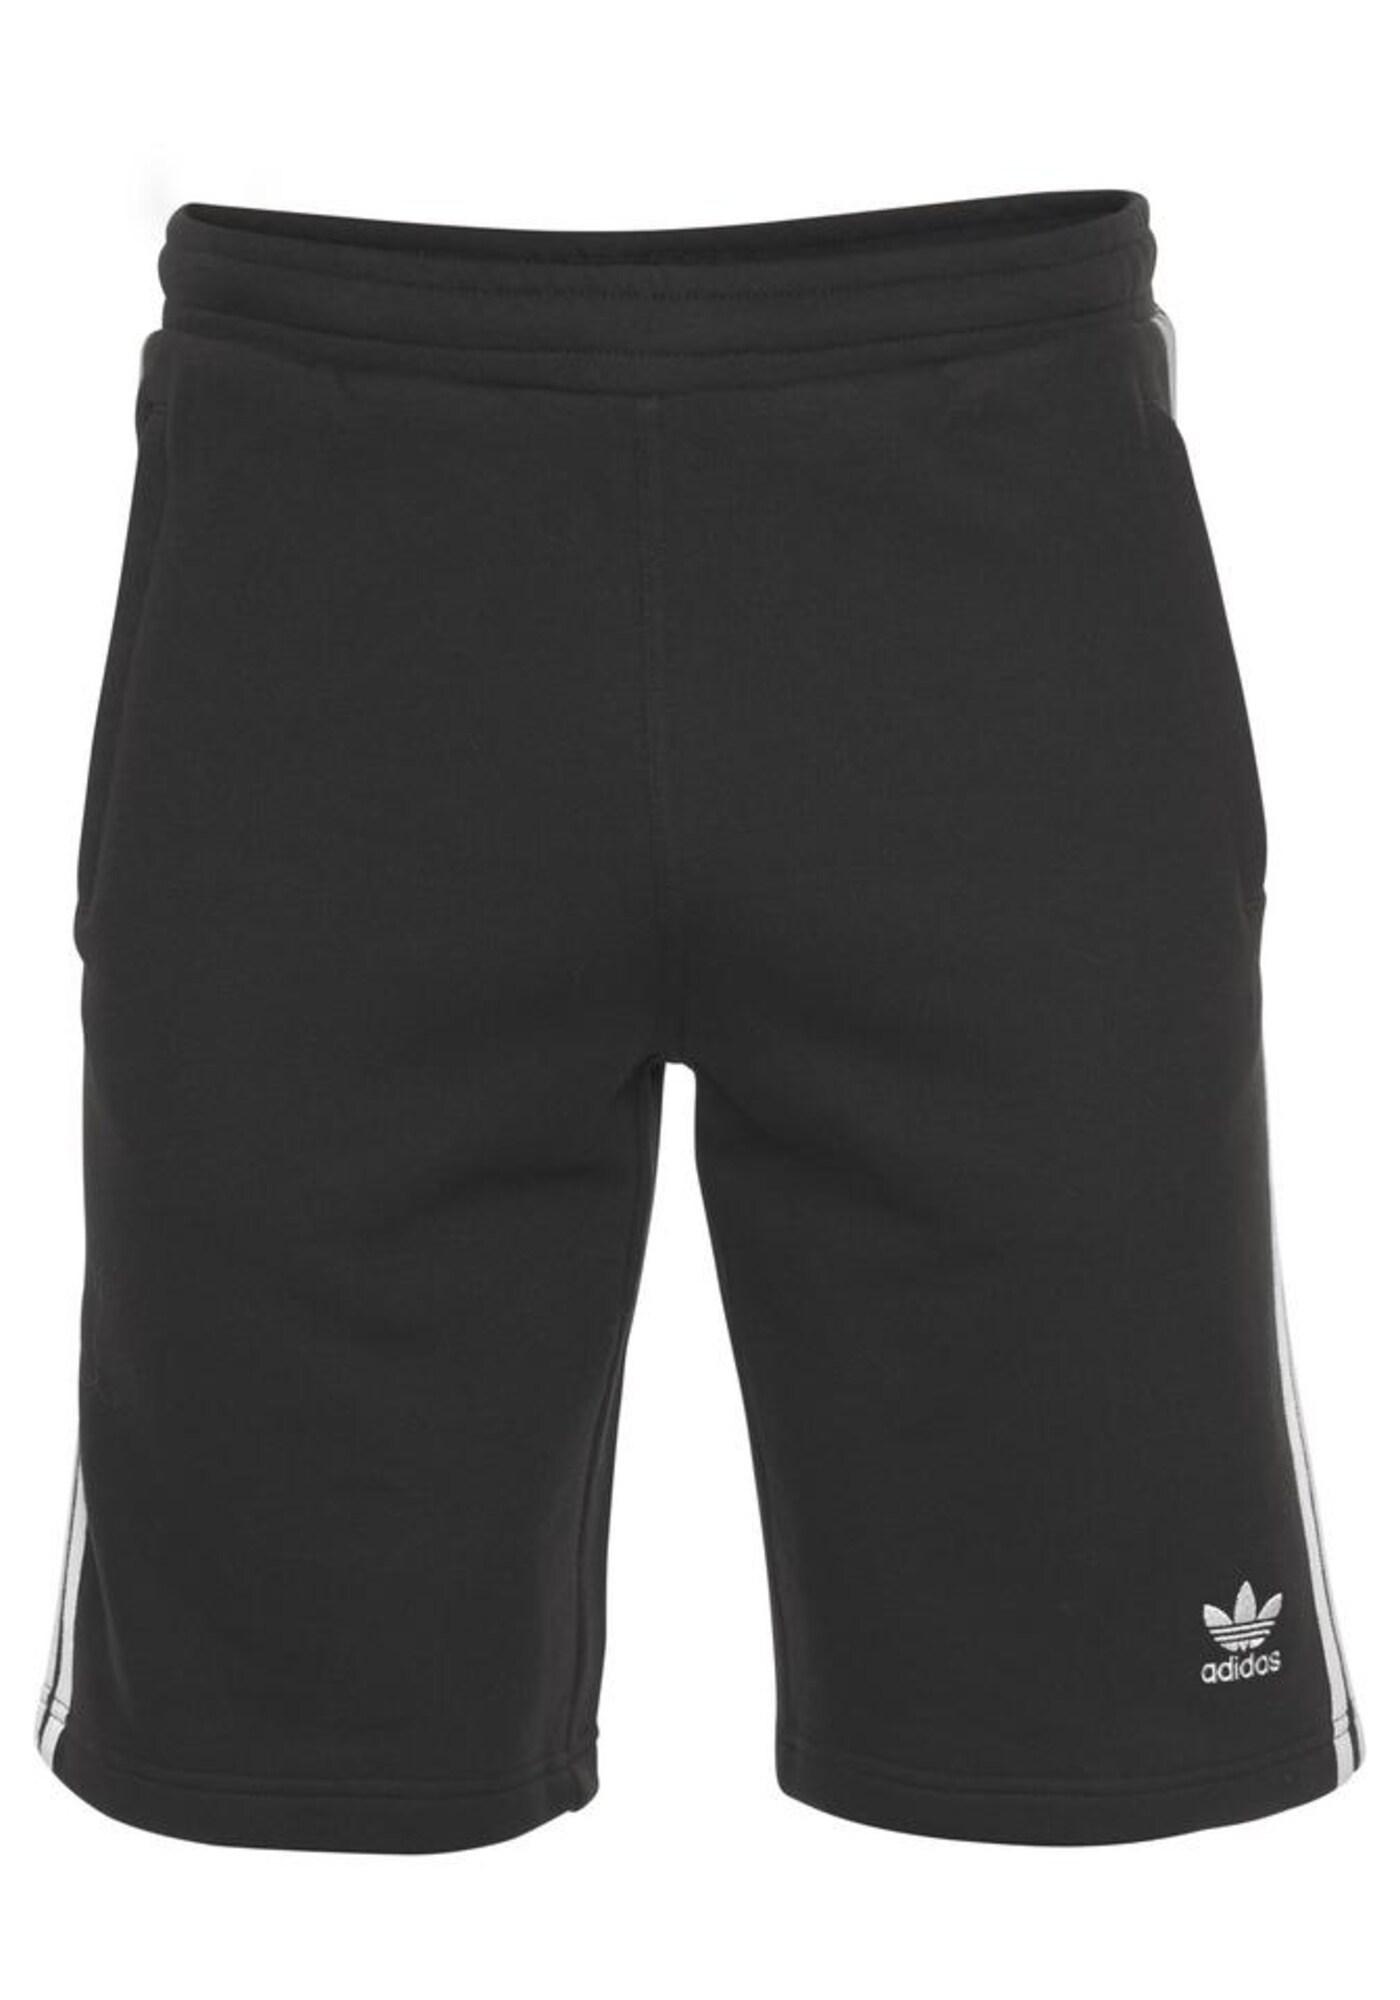 ADIDAS ORIGINALS Kelnės juoda / balta